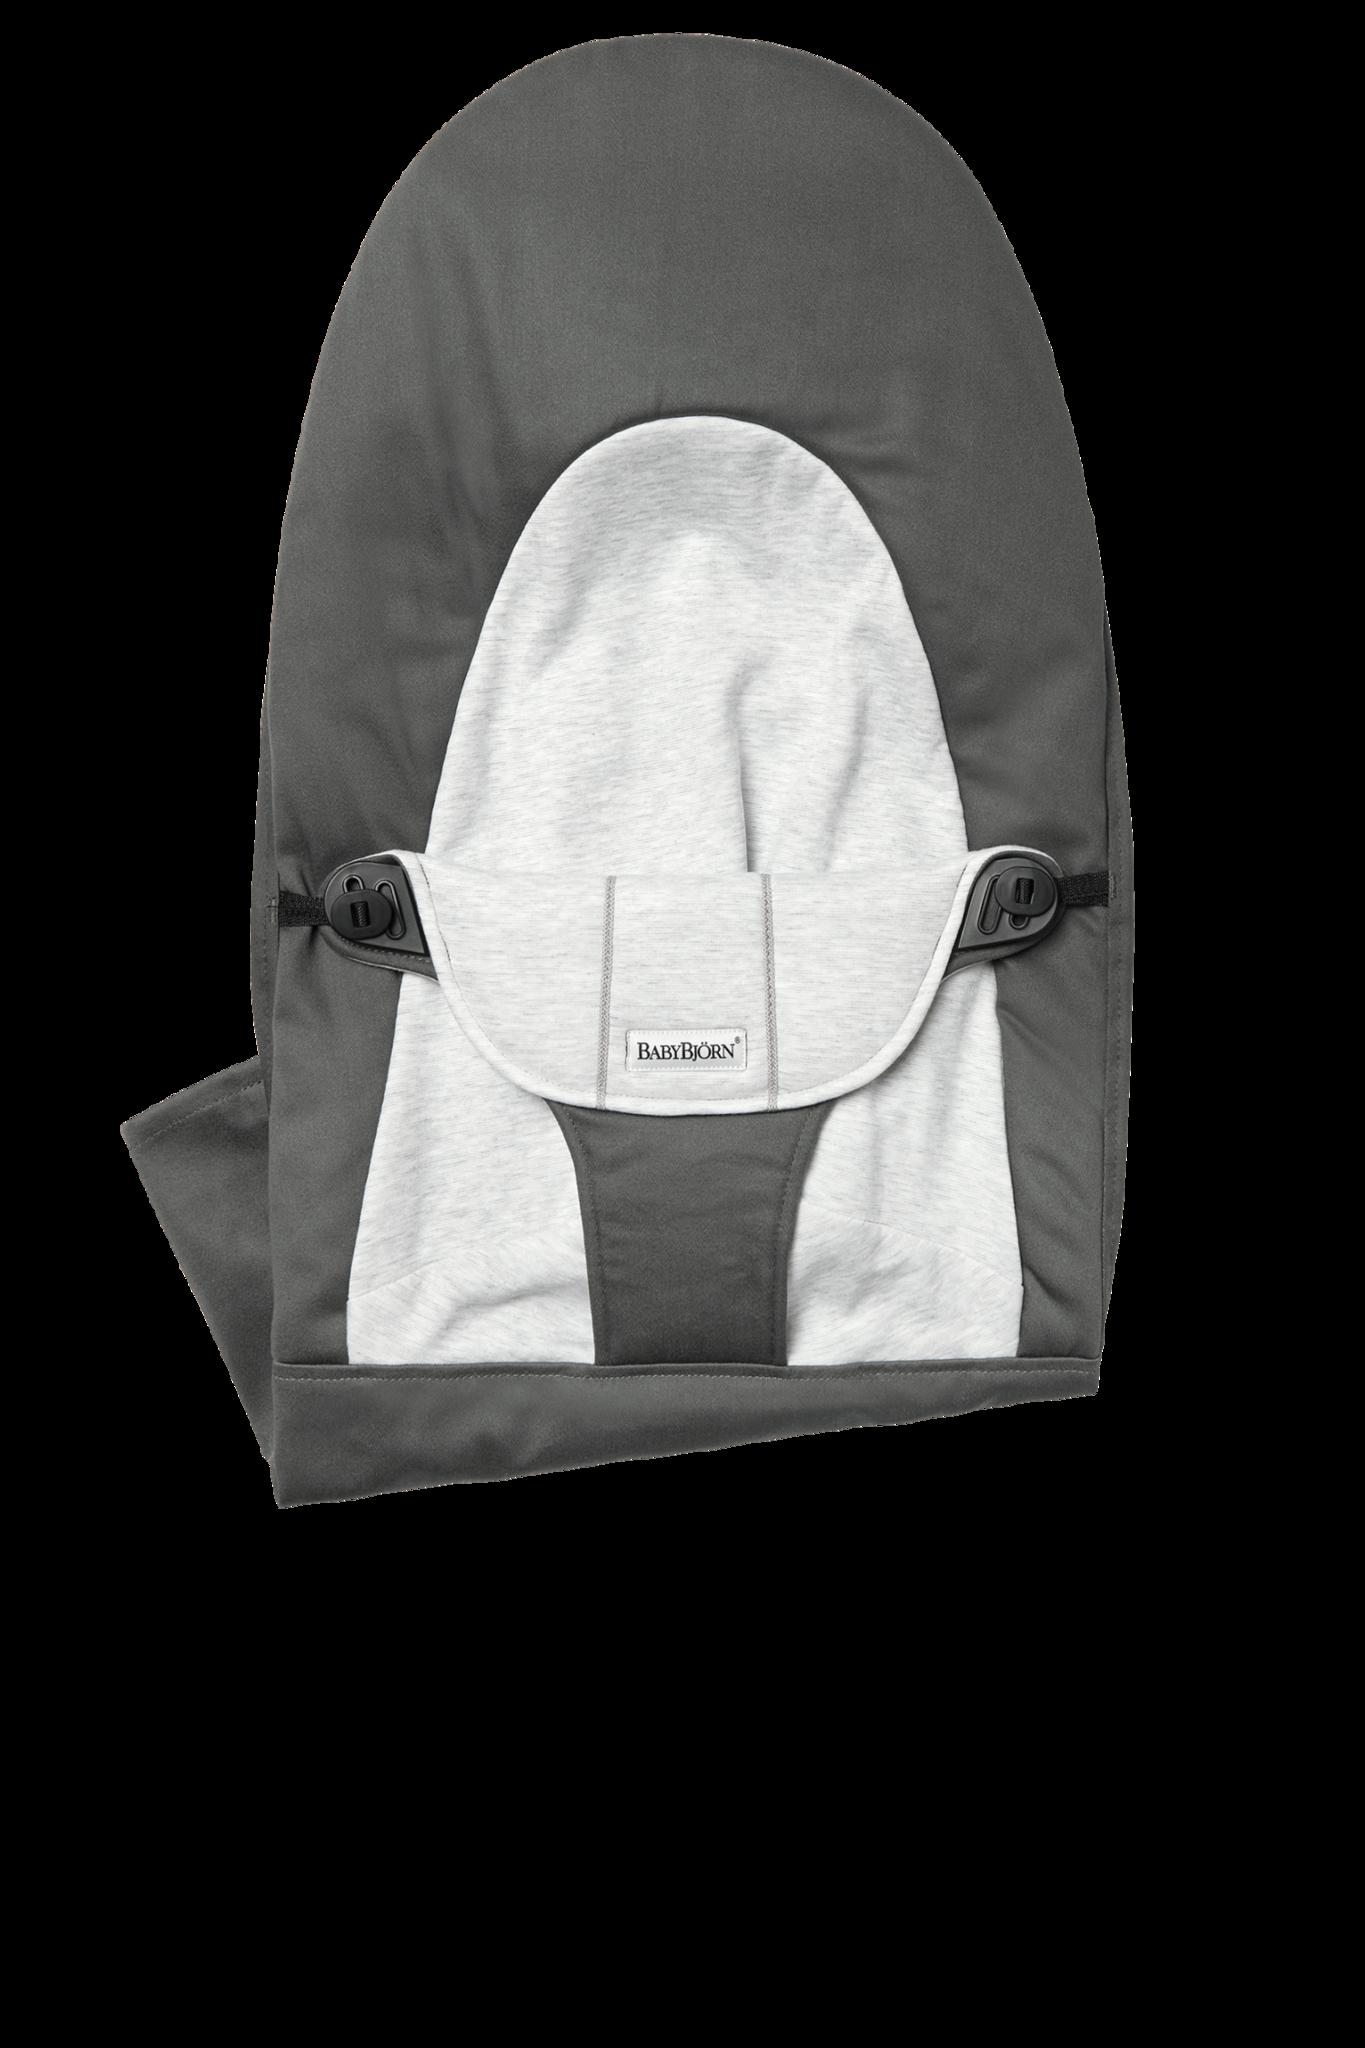 BABYBJÖRN Stoffen Zitting Balance Soft Donkergrijs Grijs Cotton/Jersey